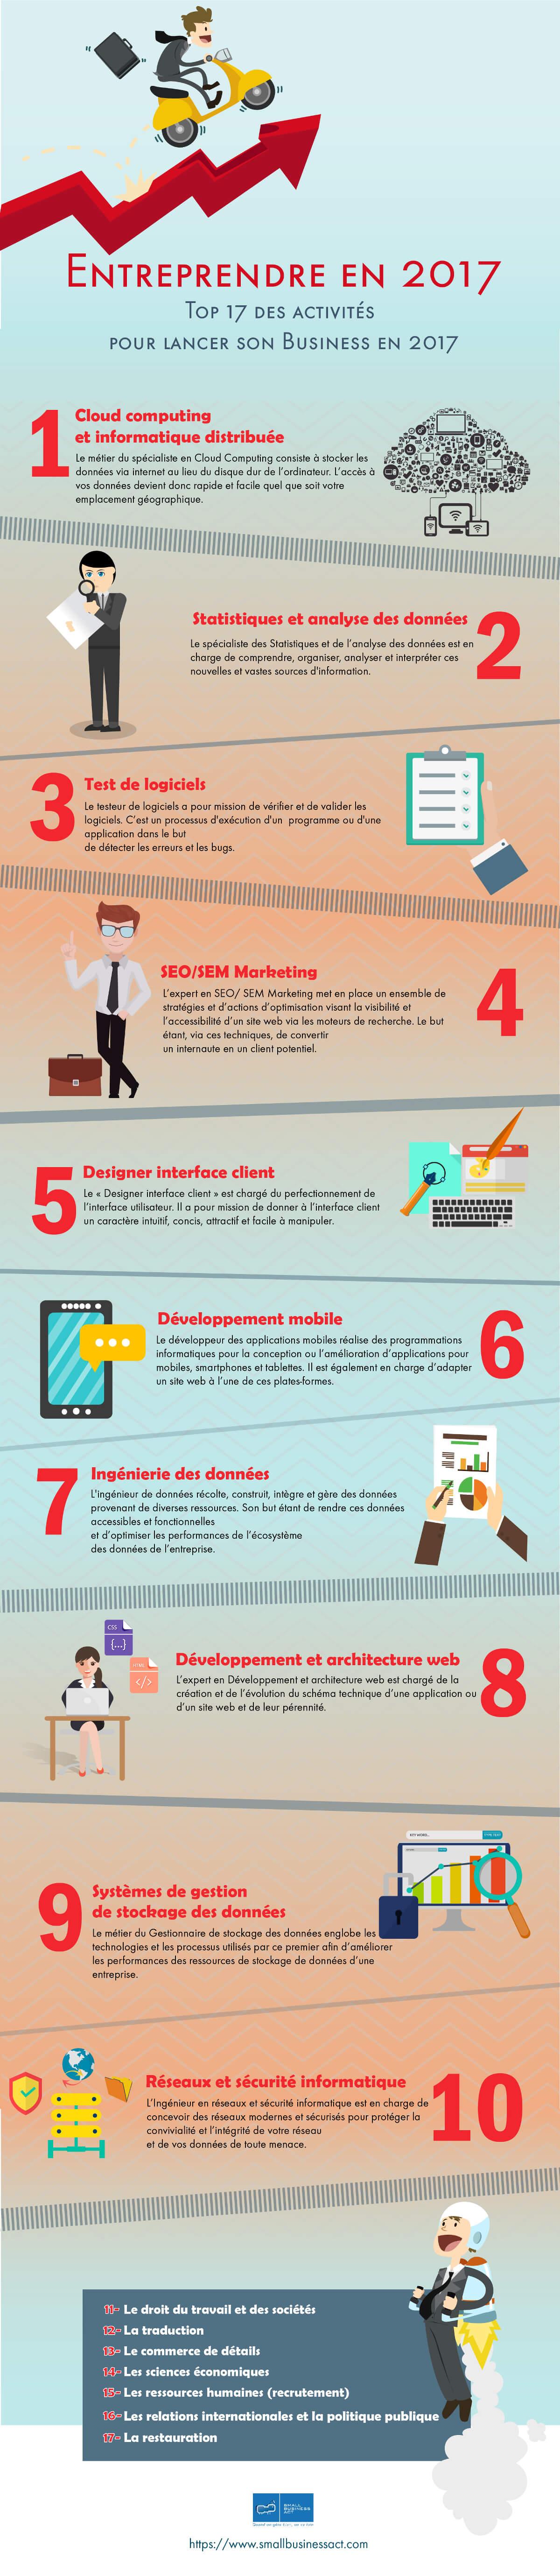 TOP 17 activités lancer Business 2017 - infographie